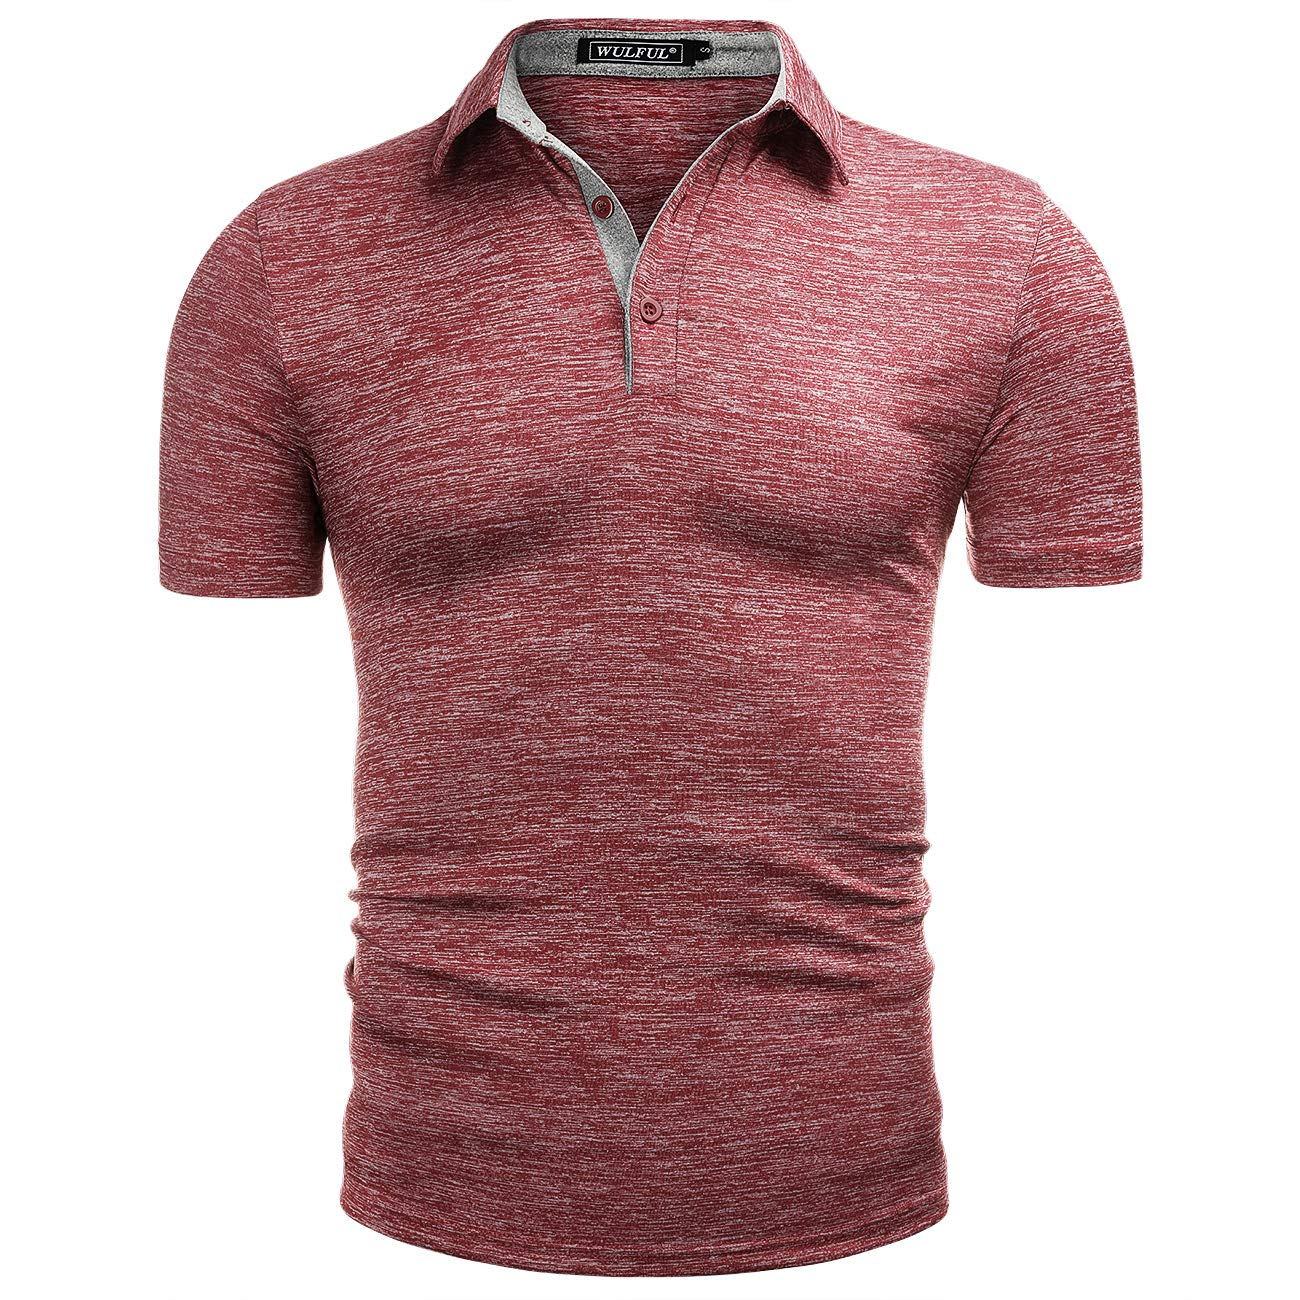 WULFUL Men's Polo Shirt Short Sleeve Quick Dry Golf Shirt Athletic T-Shirts